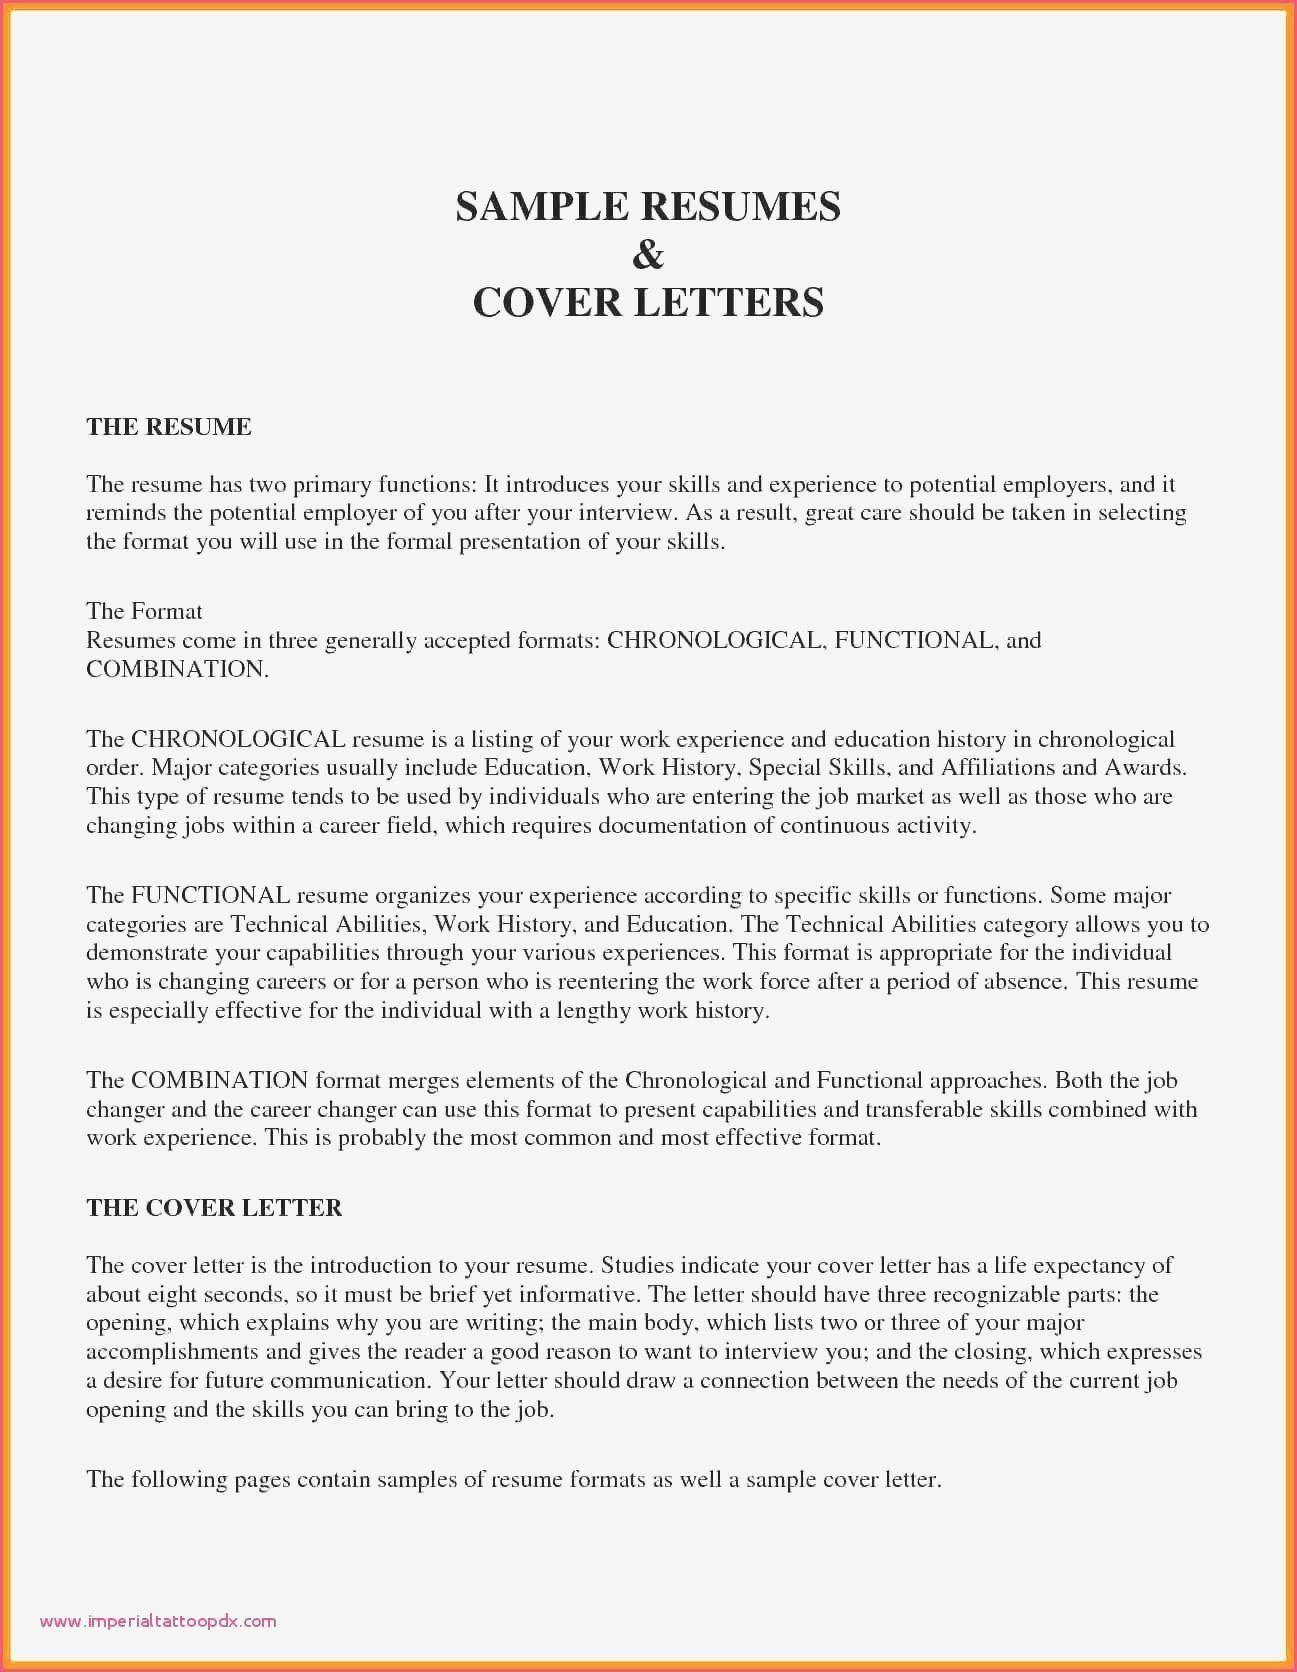 System Admin Resume Example Beautiful Hr Assistant Skills Cover Letter For Resume Sample Resume Cover Letter Career Change Resume